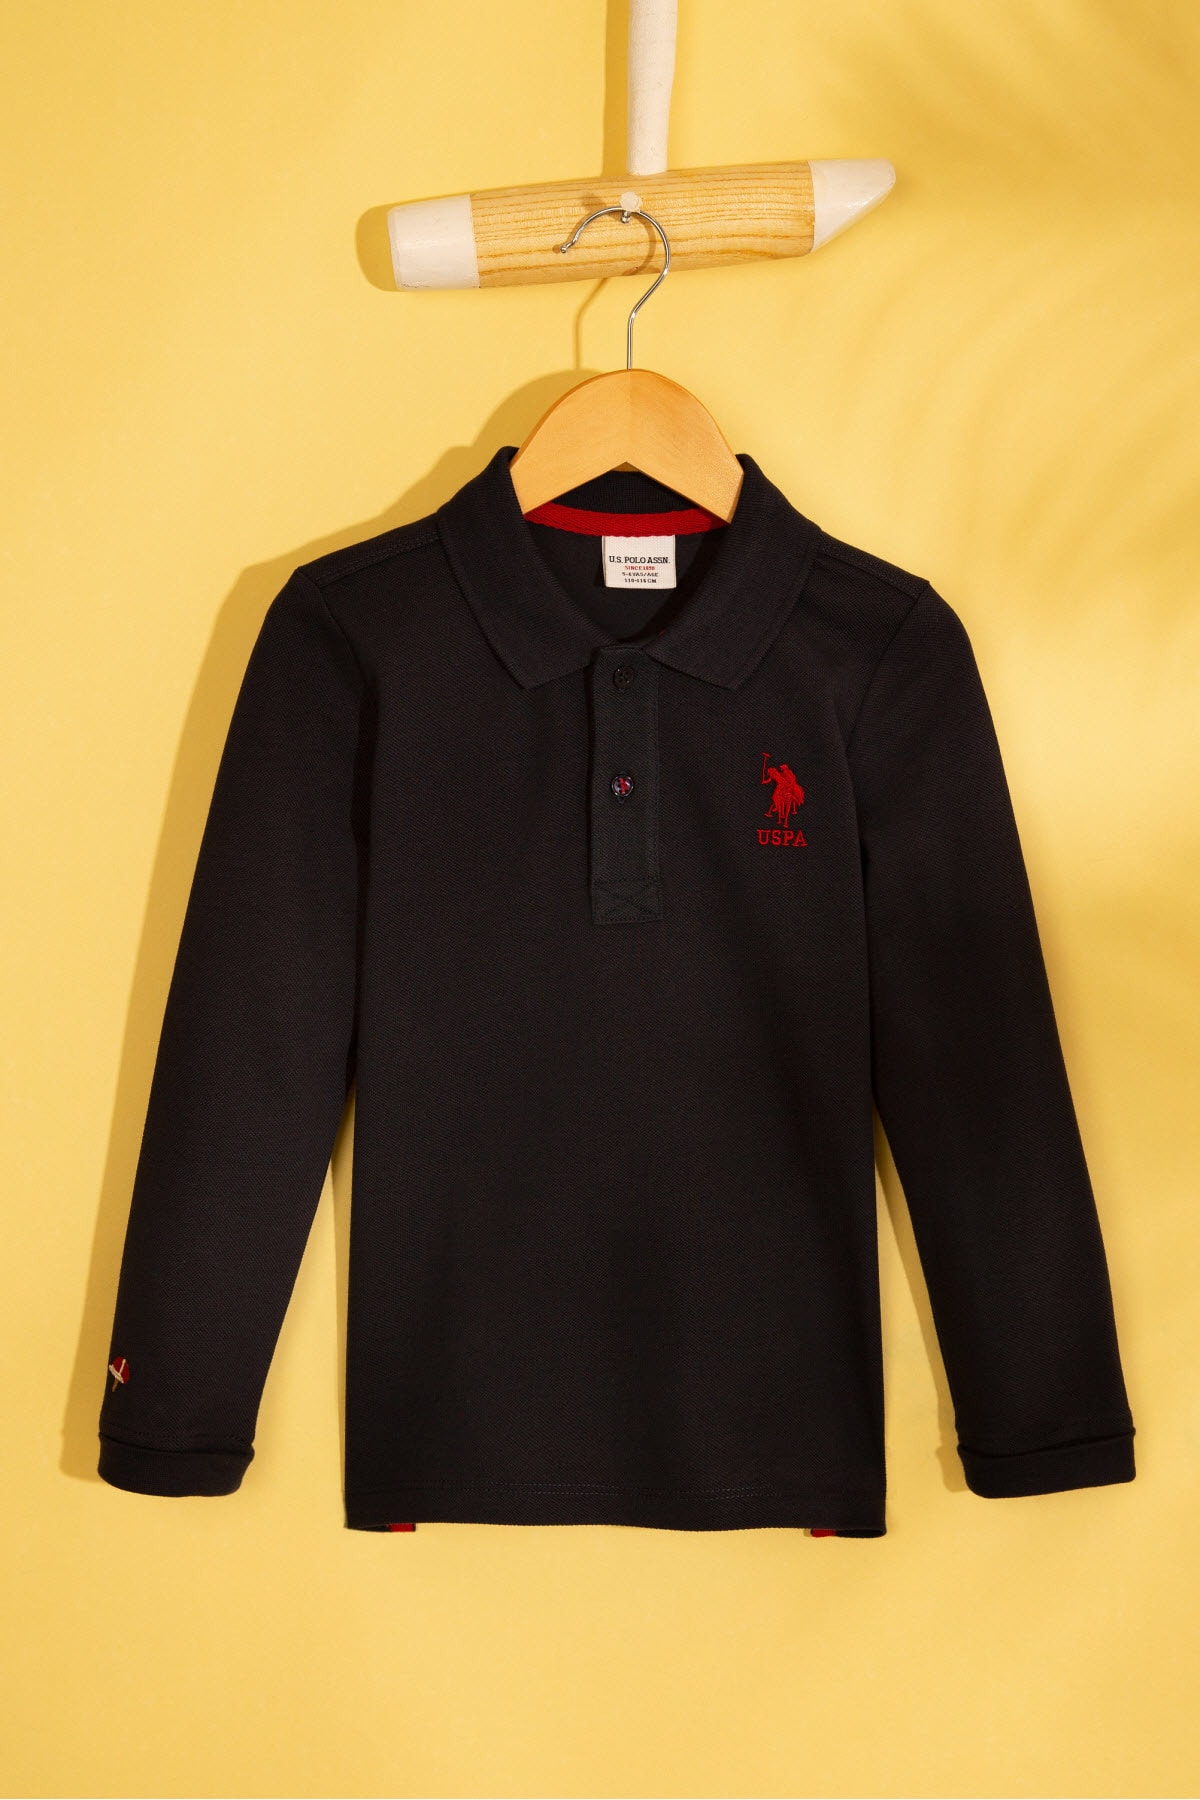 U.S. Polo Assn. Lacivert Erkek Çocuk Sweatshirt 1